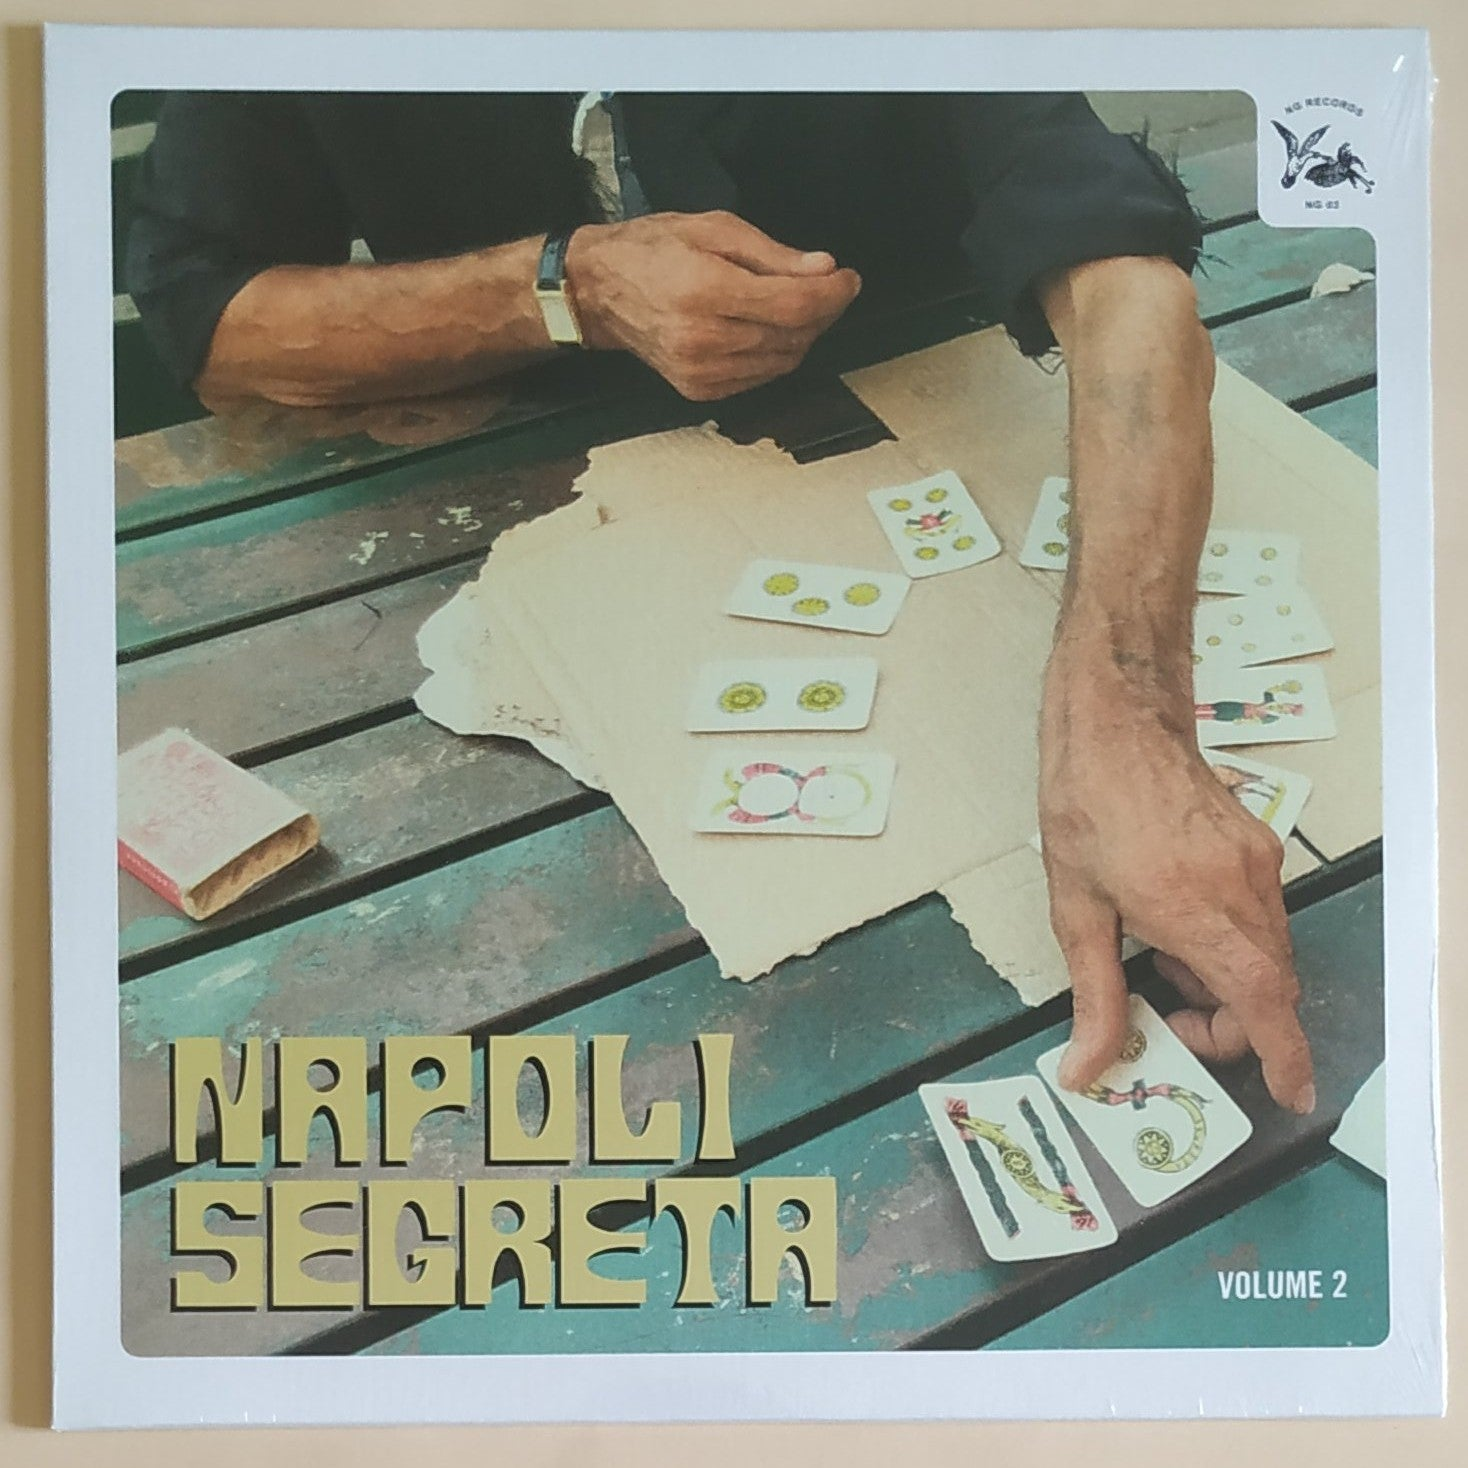 Image of Napoli Segreta Vol. 2